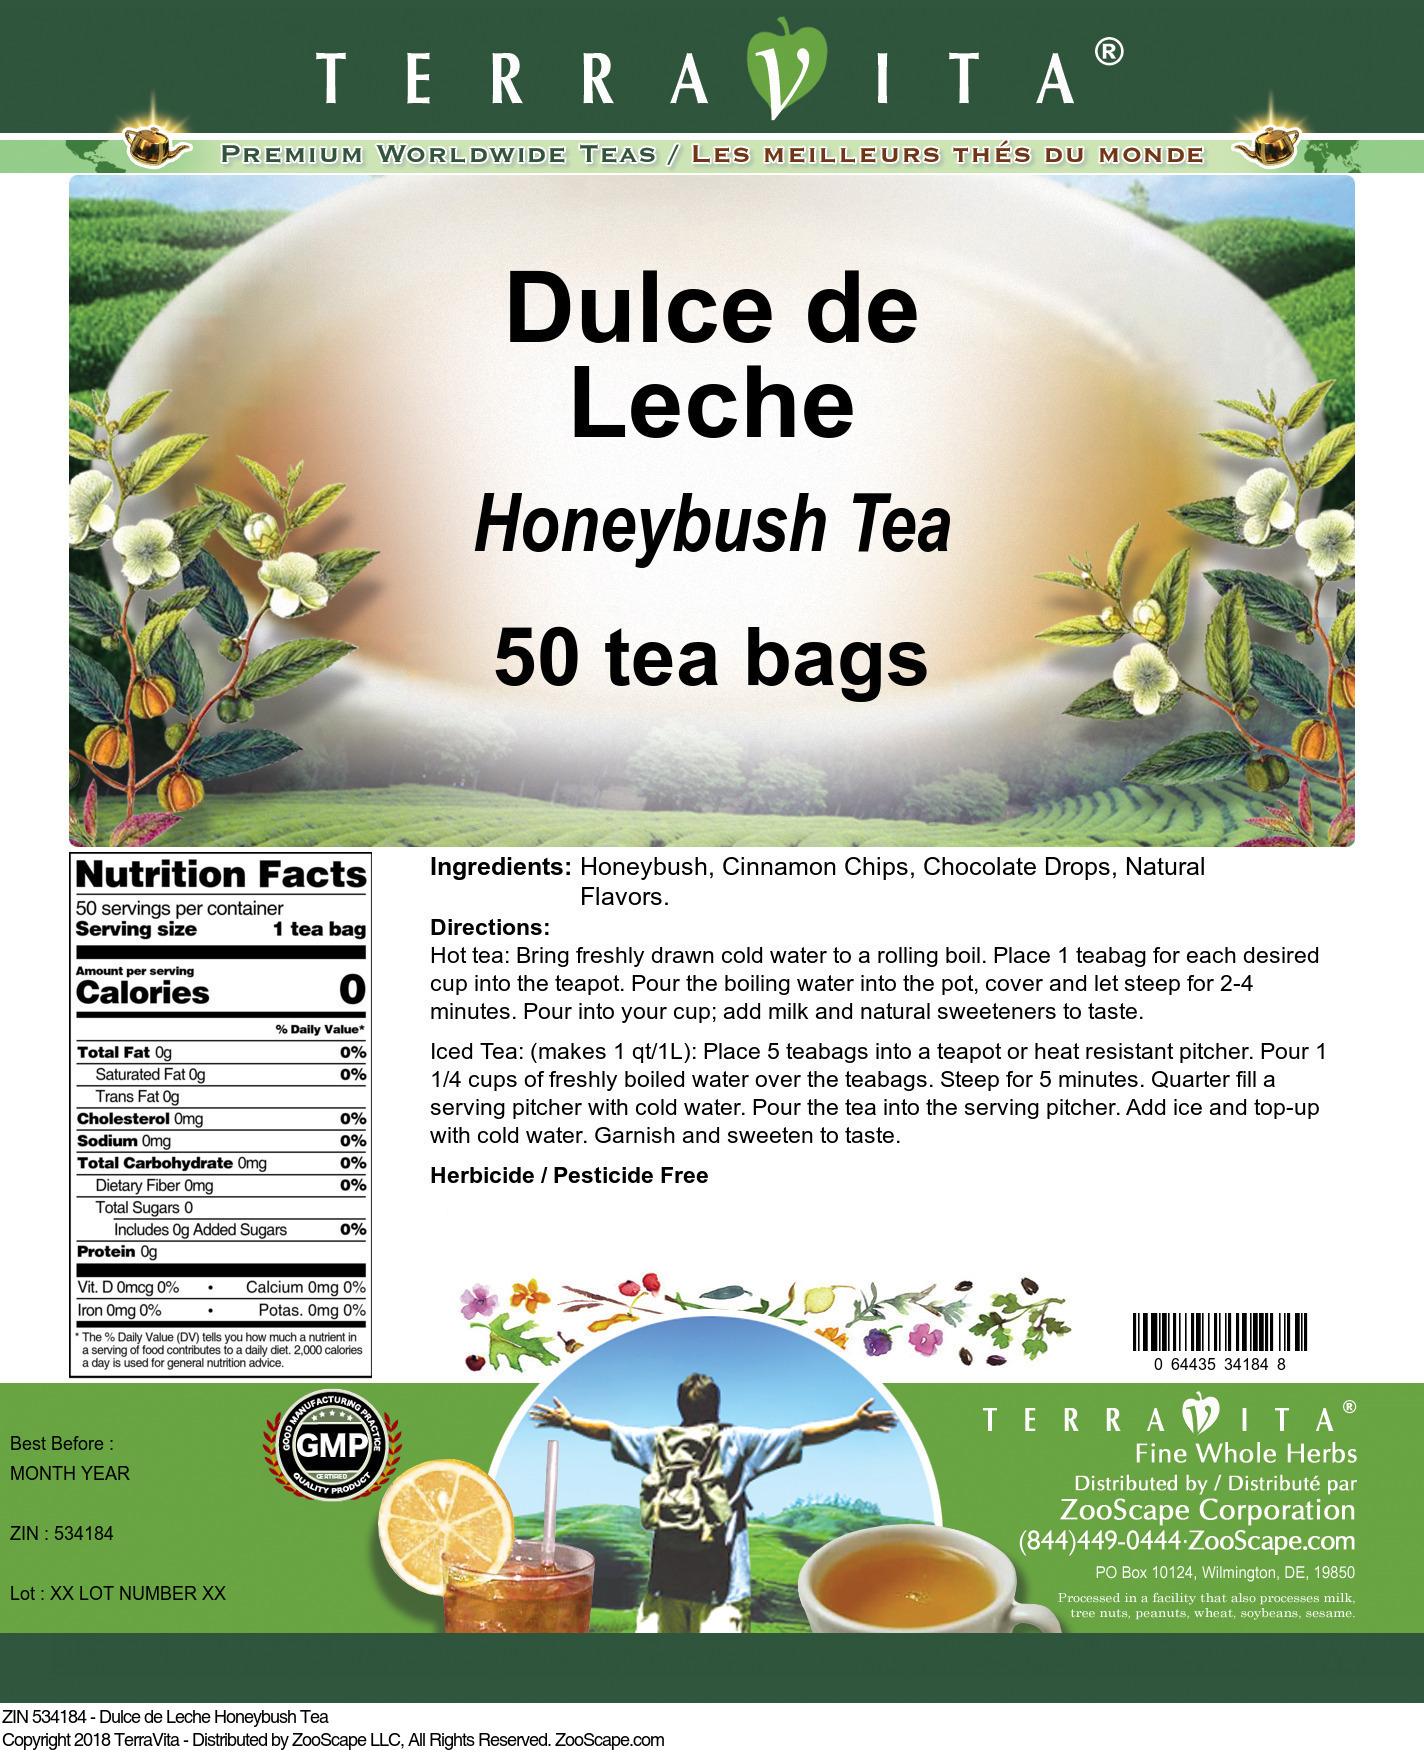 Dulce de Leche Honeybush Tea